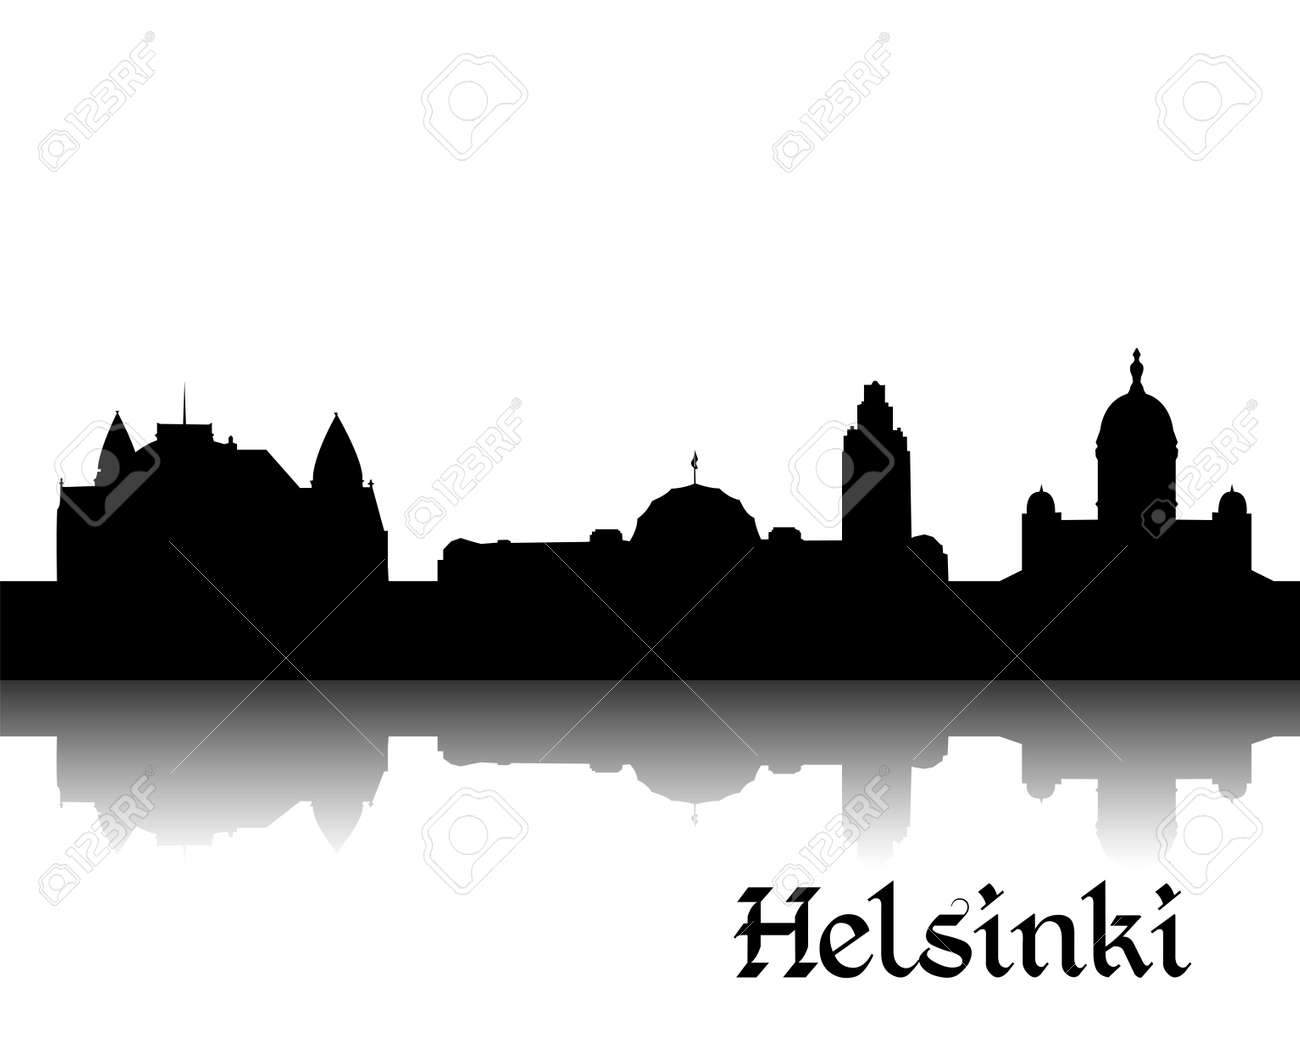 Black silhouette of Helsinki the capital of Finland - 16456286